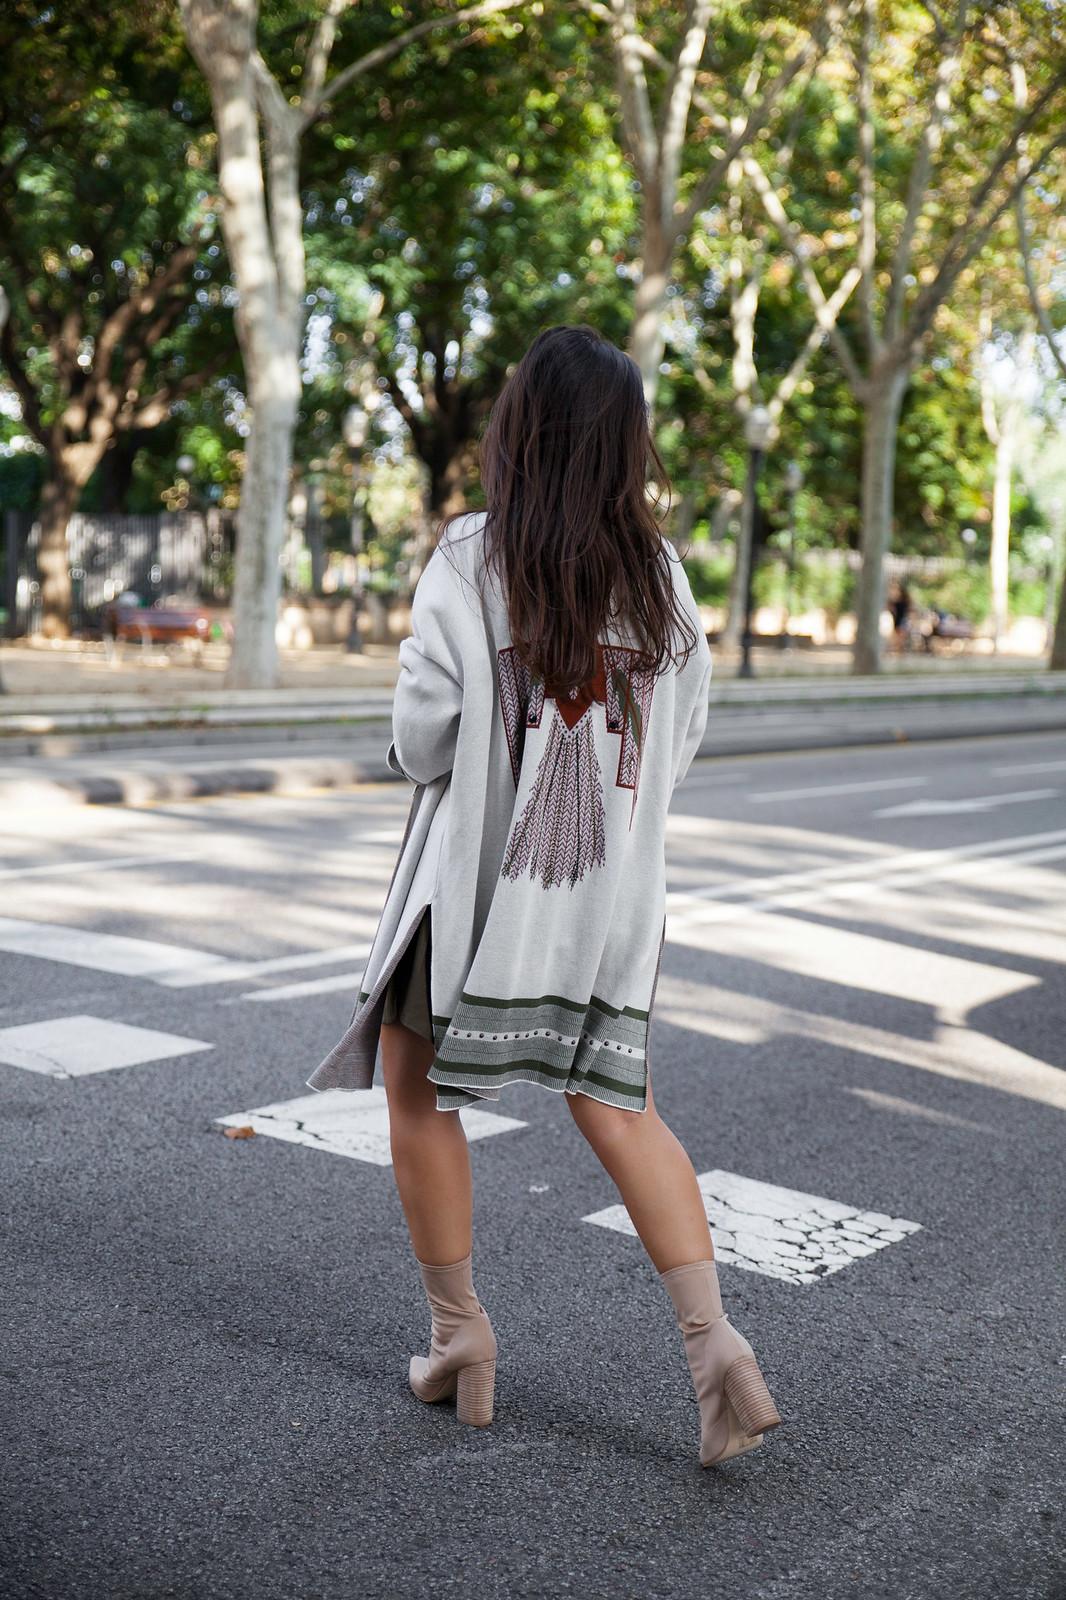 06_Como_combinar_un_cardigan_khaki_etnico_otoño_theguestgirl_rüga_laura_santolaira_influencer_embarazada_fashion_street_style_barcelona